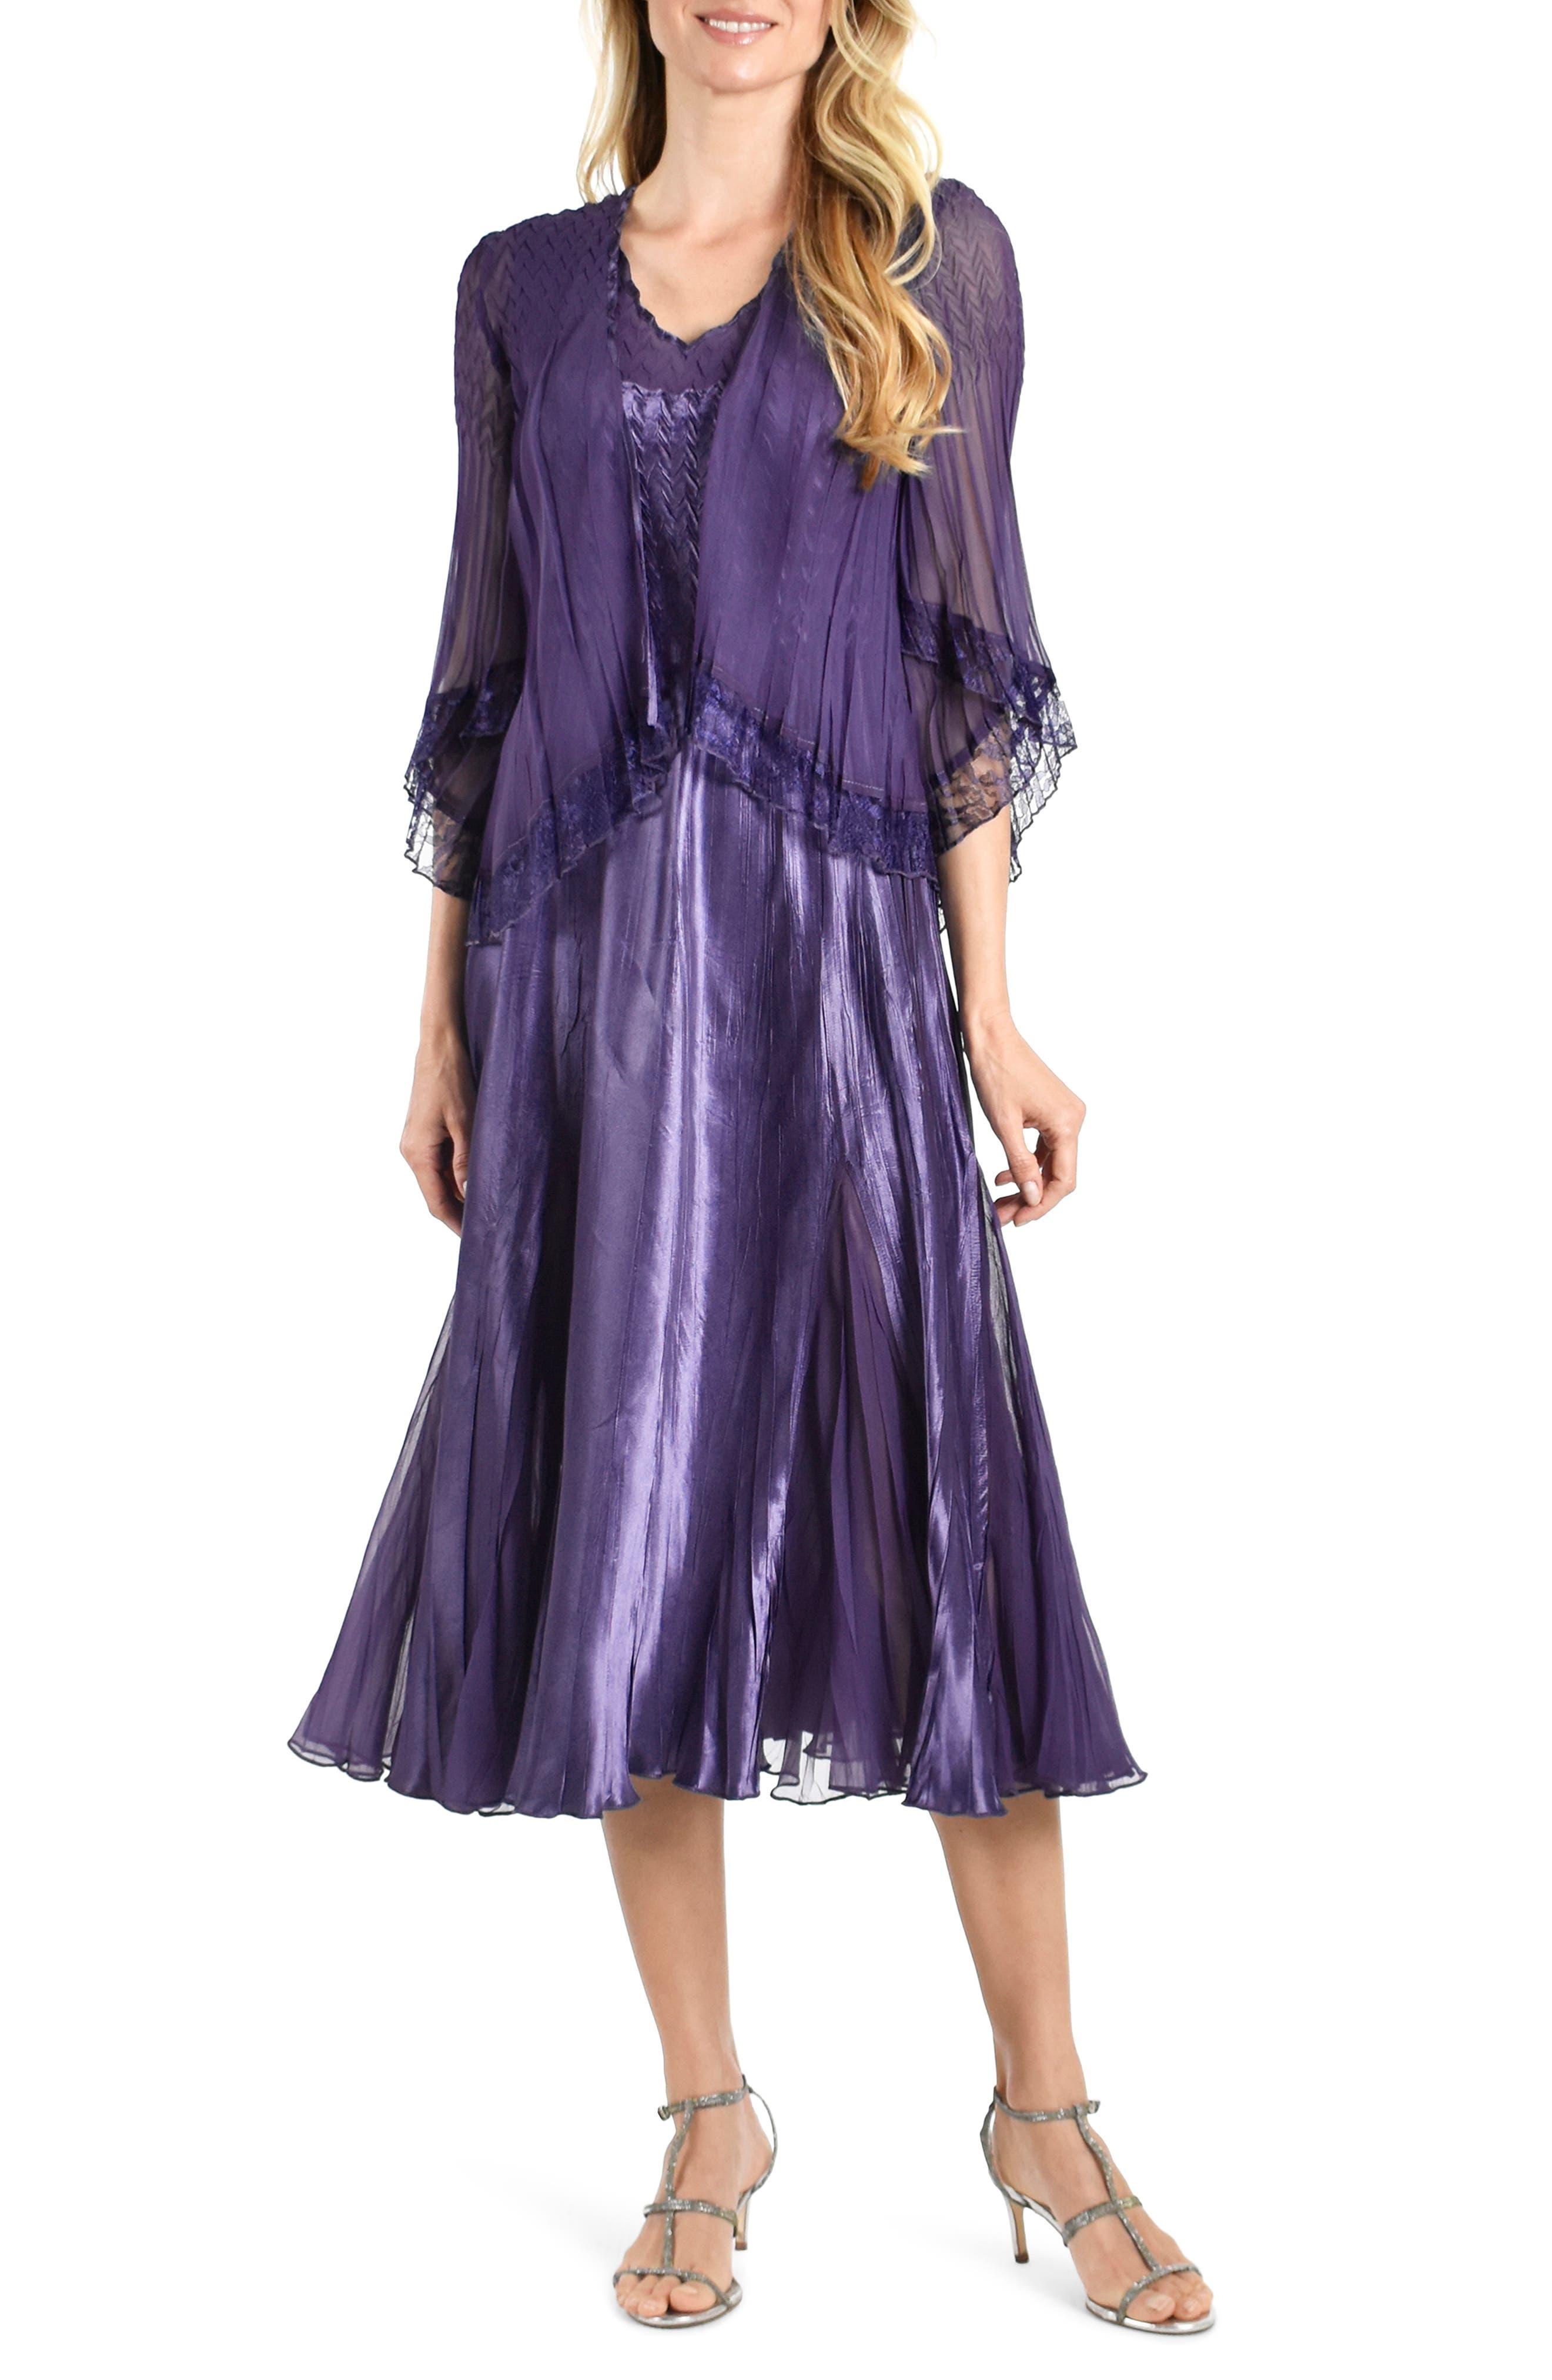 1920s Formal Dresses & Evening Gowns Guide Womens Komarov Charmeuse  Chiffon Midi Dress With Jacket Size Medium - Purple $438.00 AT vintagedancer.com